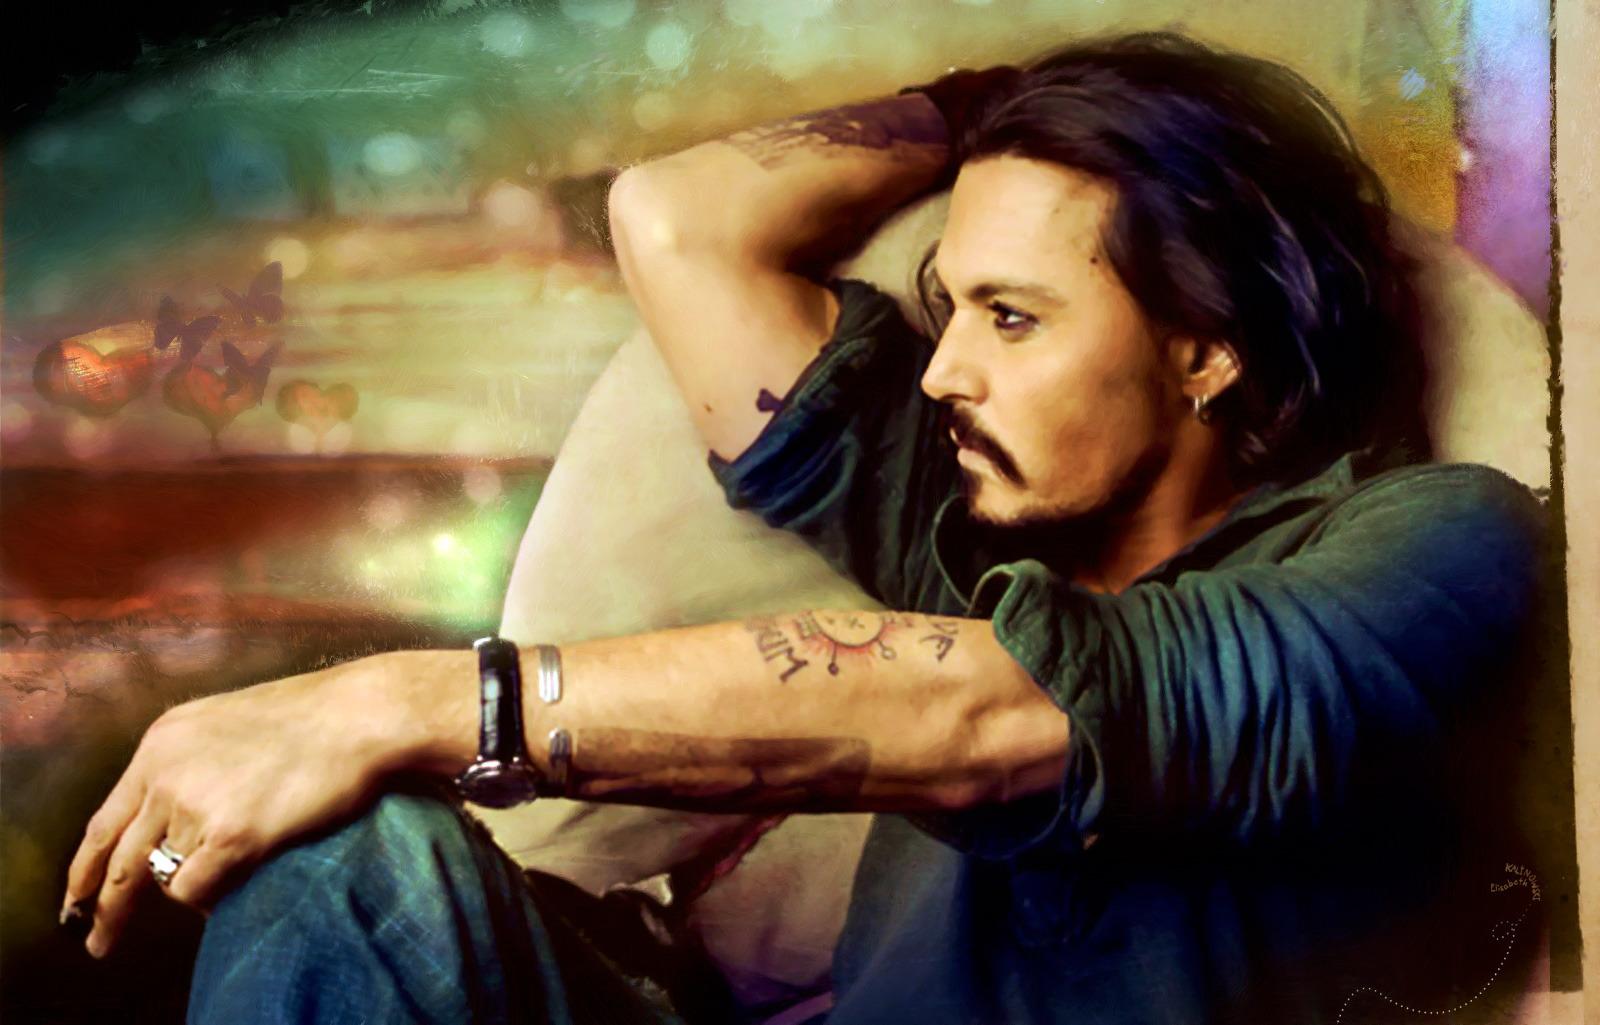 johnny depp   Johnny Depp Photo 17449229 1600x1025